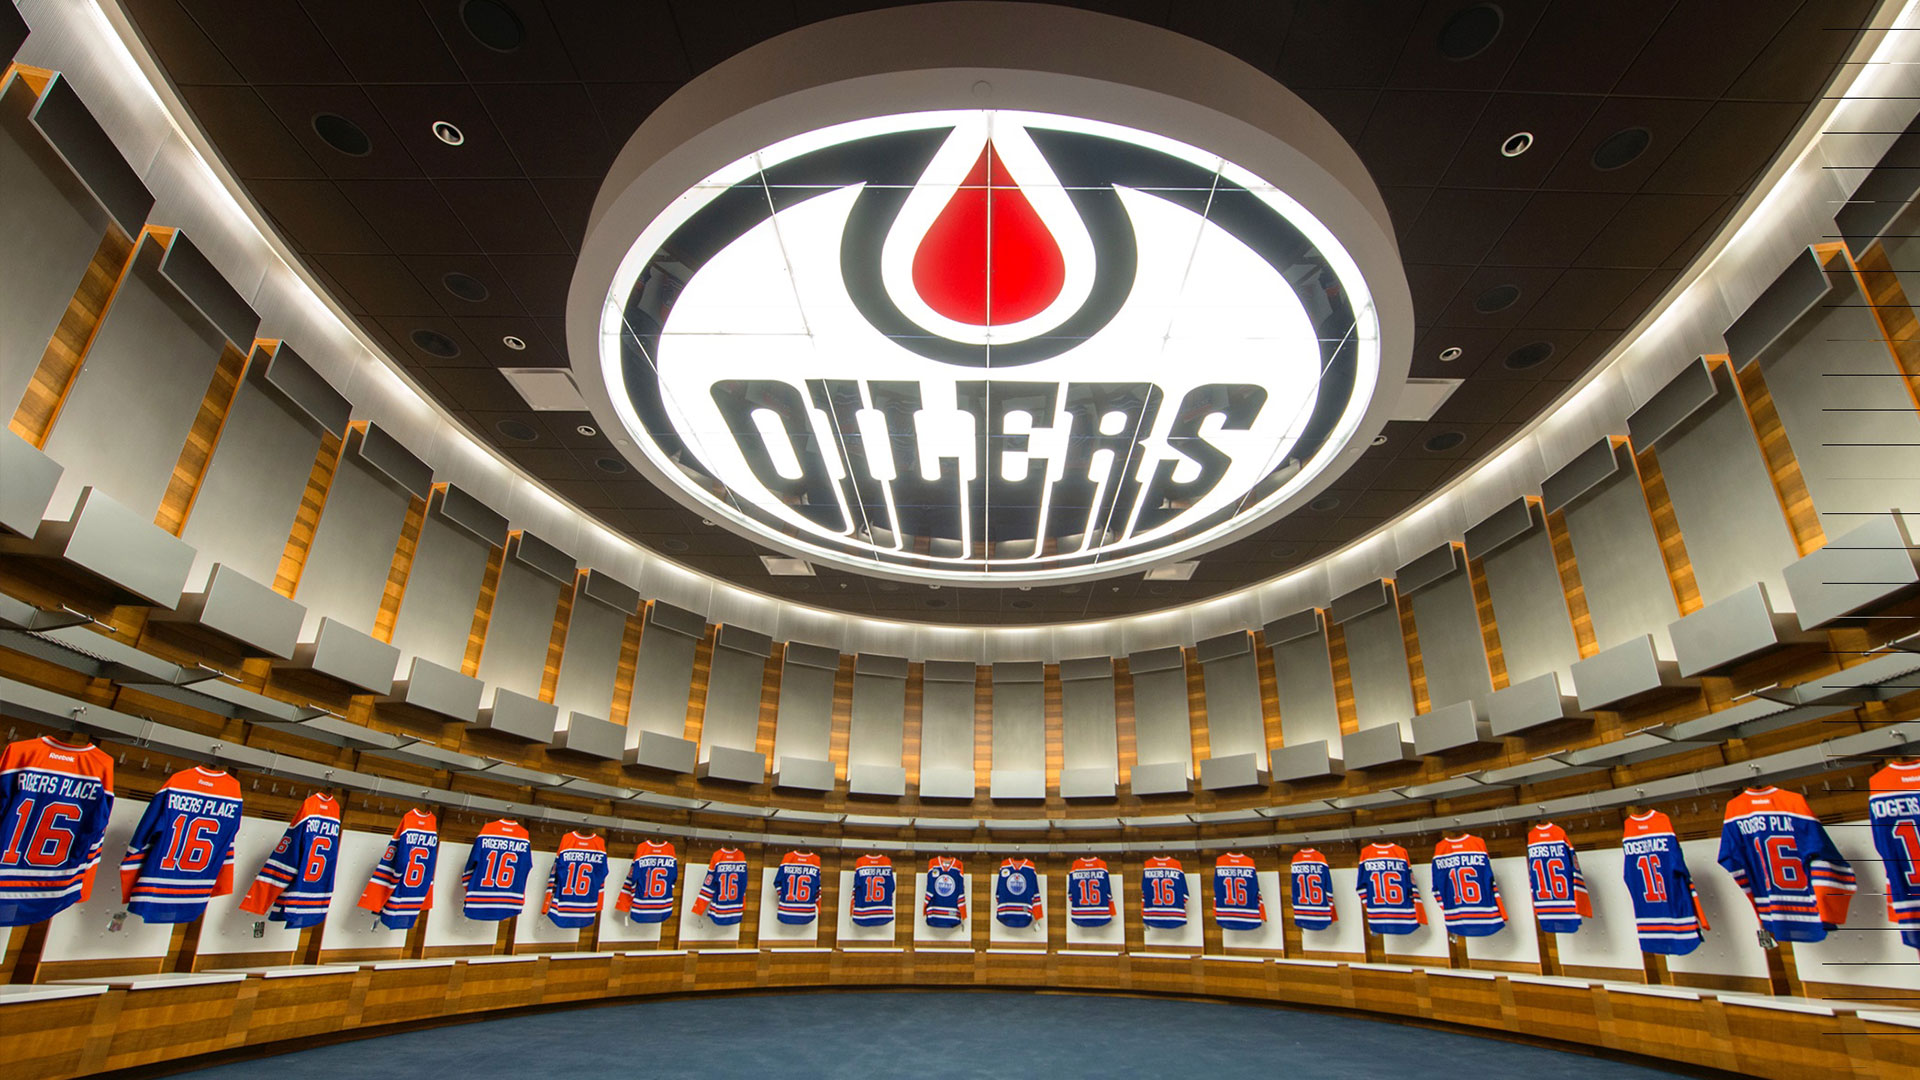 Most Inspiring Wallpaper Logo Edmonton Oilers - lockerroomslider  Image_474644.jpg